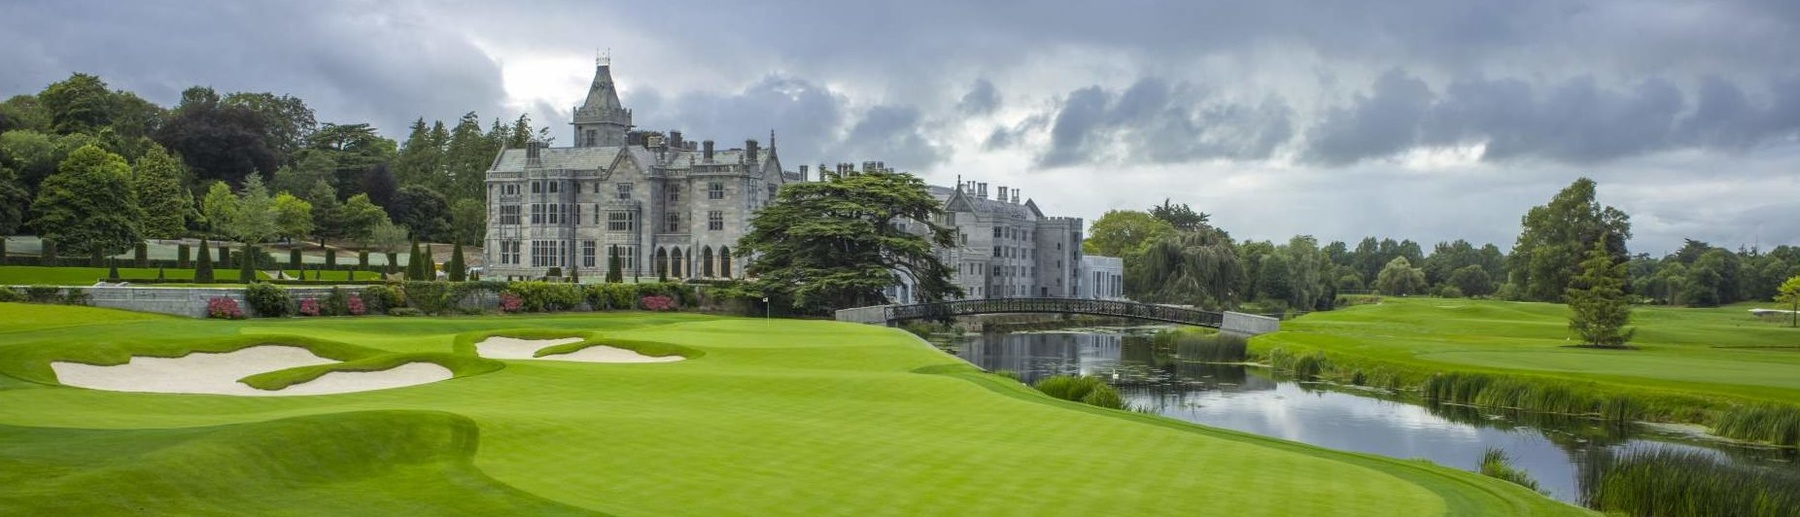 Golf at Adare Manor_18th Holerduced _